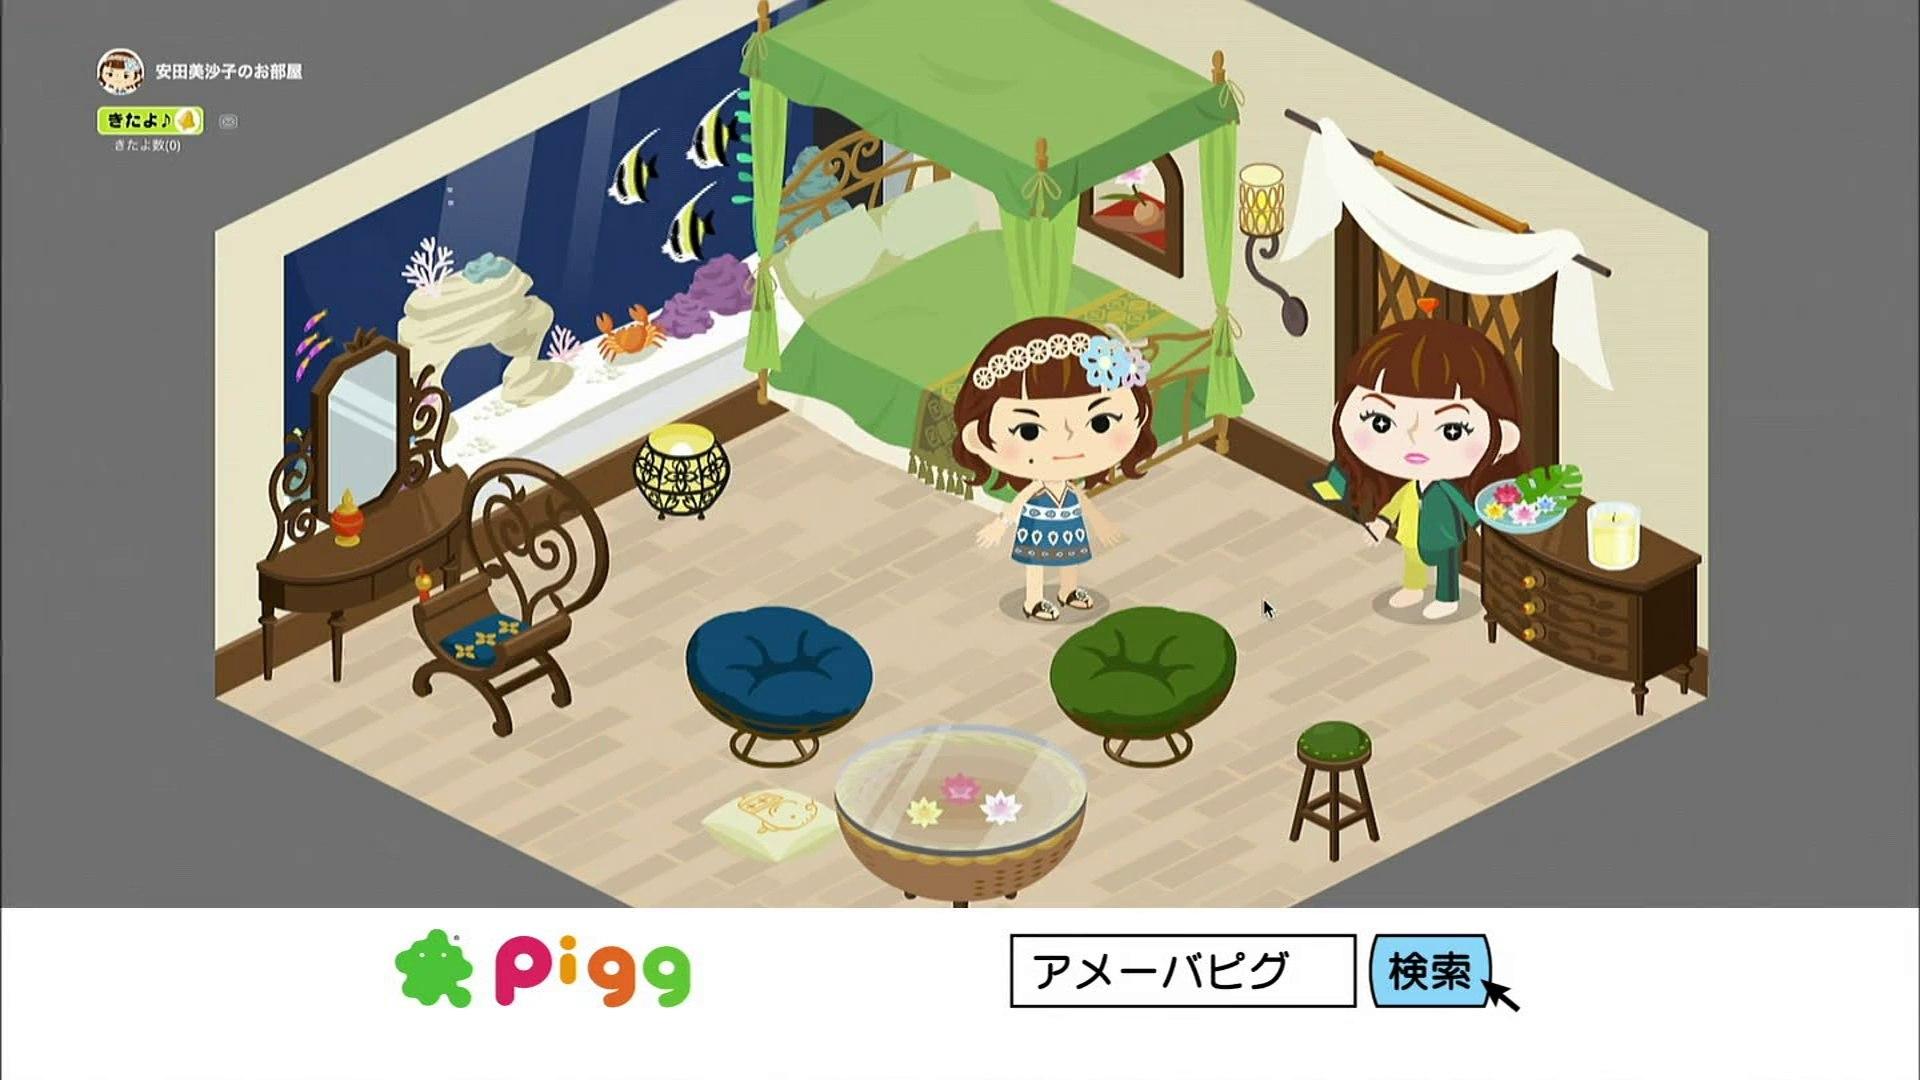 00420 cyberagent ameba pigg aki hoshino misako yasuda computers video games - Komasharu - Japanese C